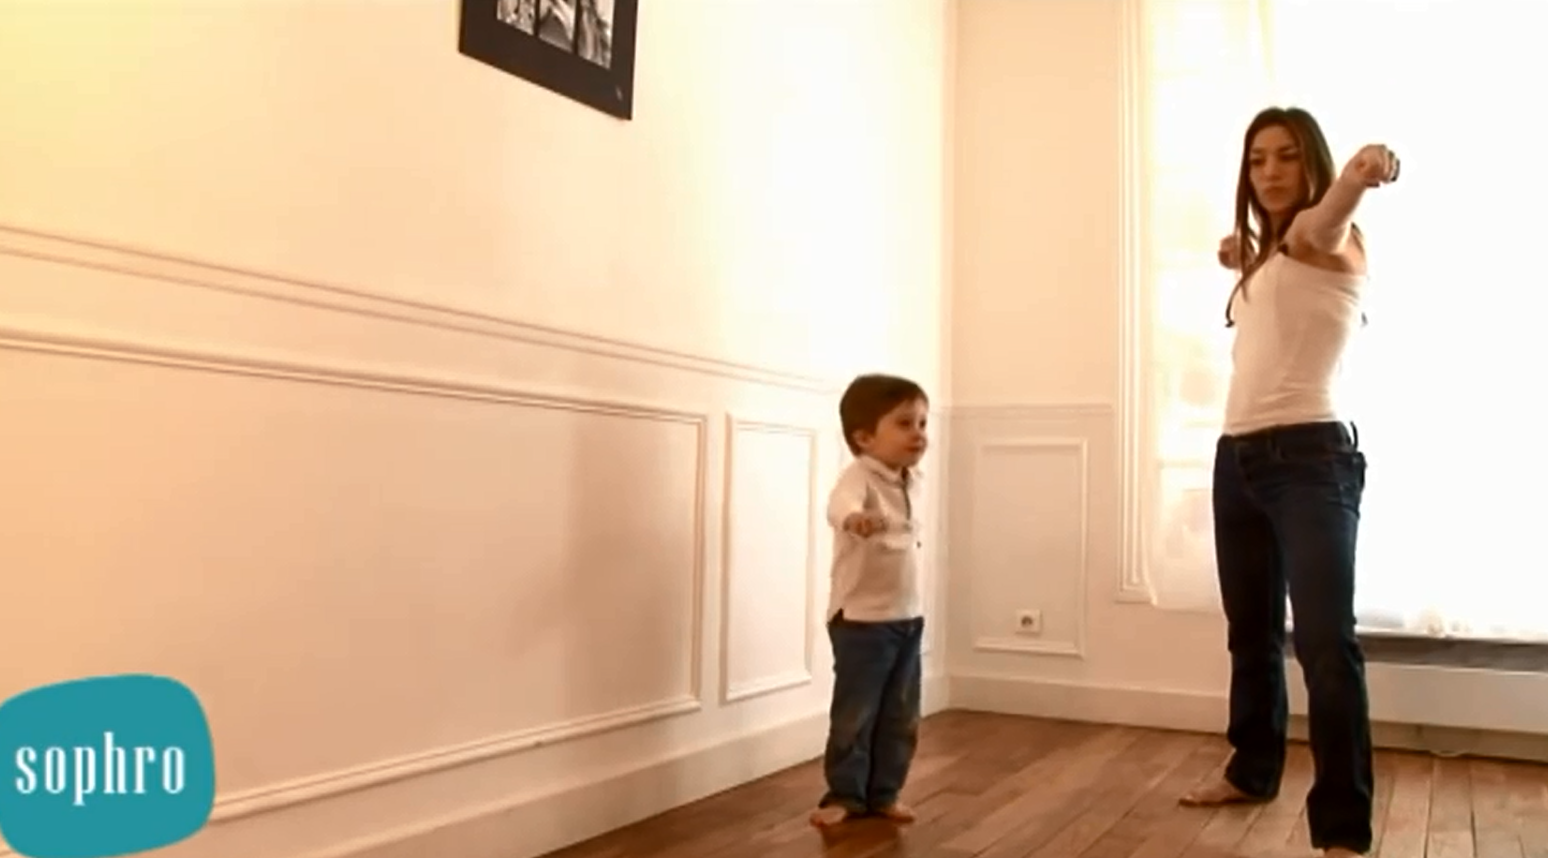 sophrologie pour les enfants 5 exercices ludiques. Black Bedroom Furniture Sets. Home Design Ideas